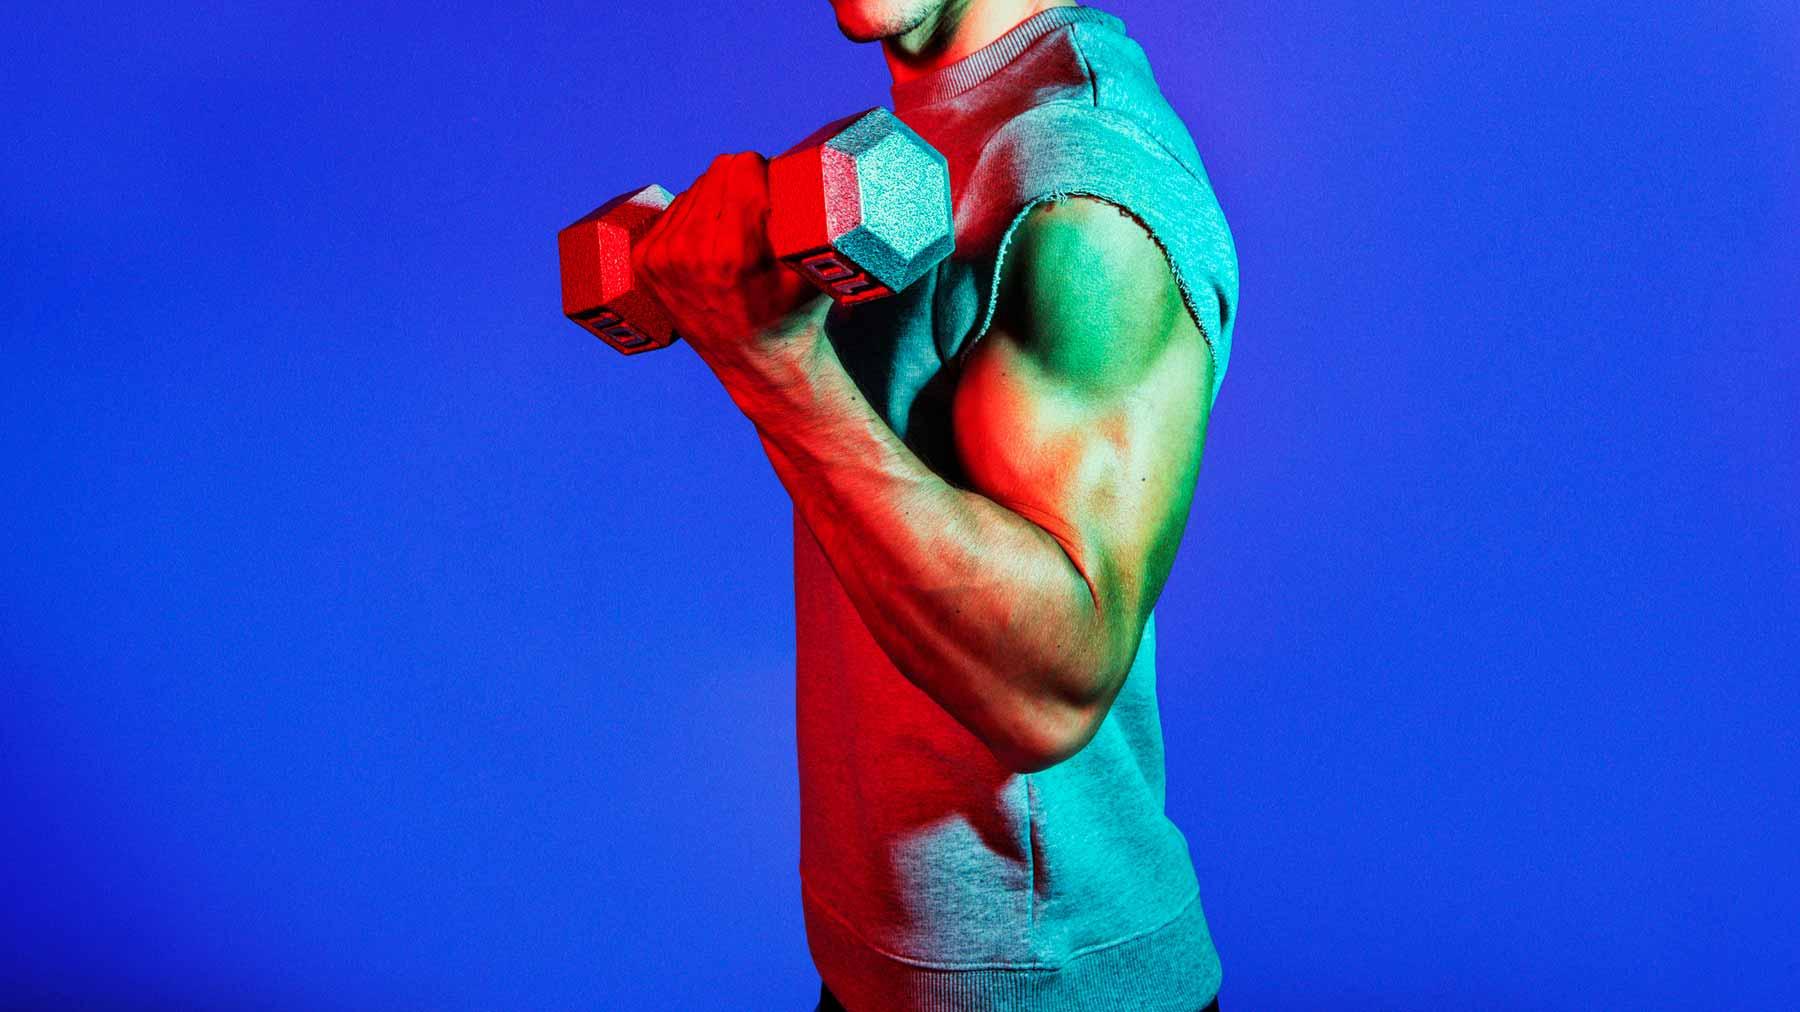 men lifting weight in gray sleeveless shirt